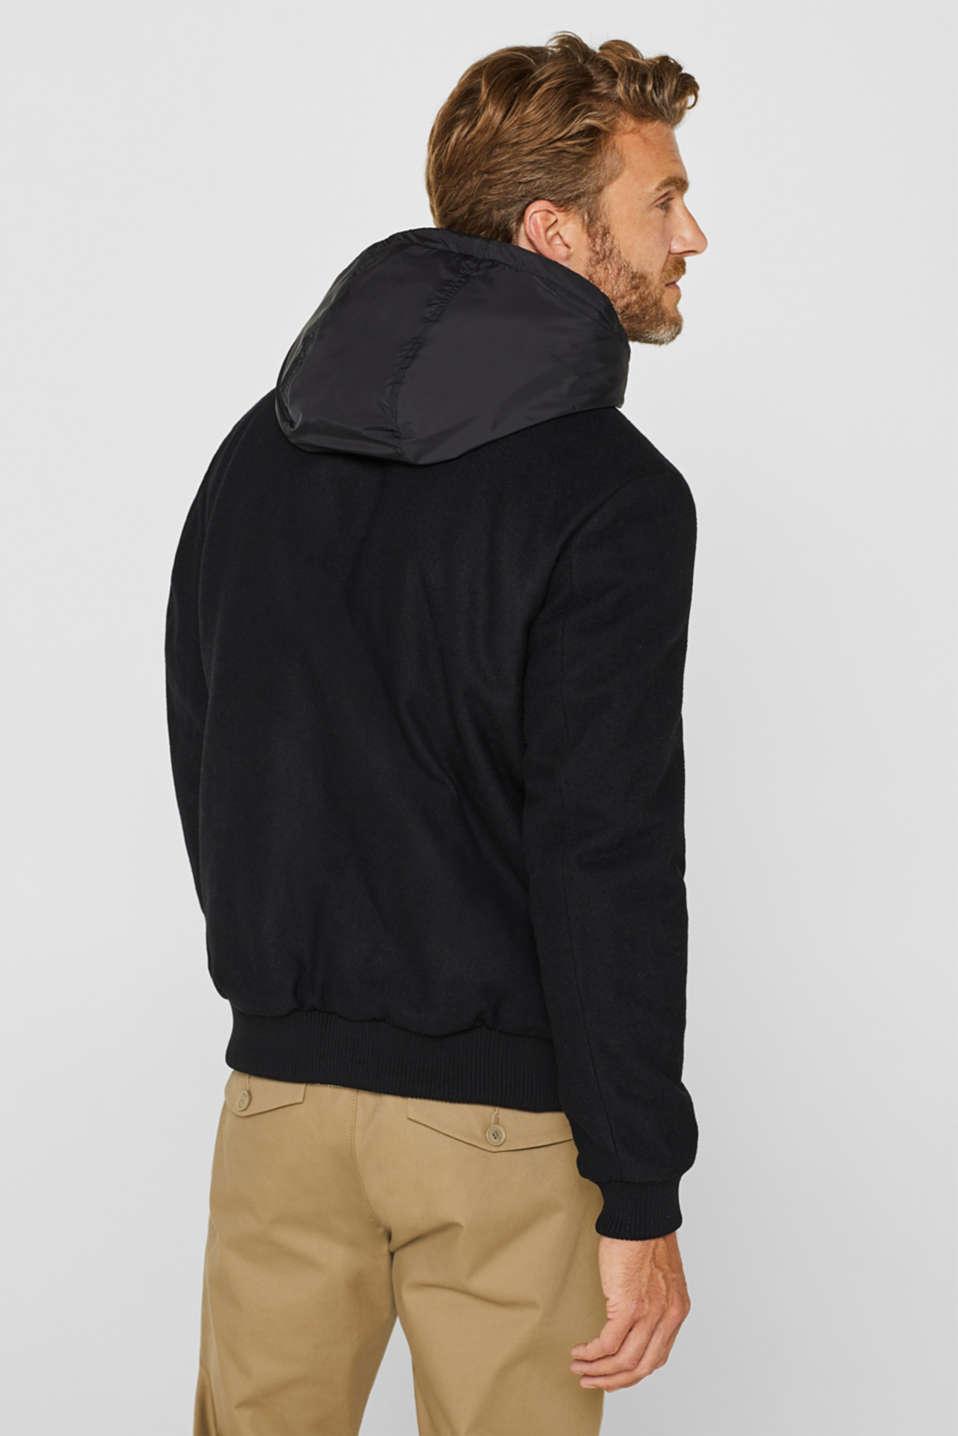 With wool: Jacket with adjustable hood, BLACK, detail image number 3